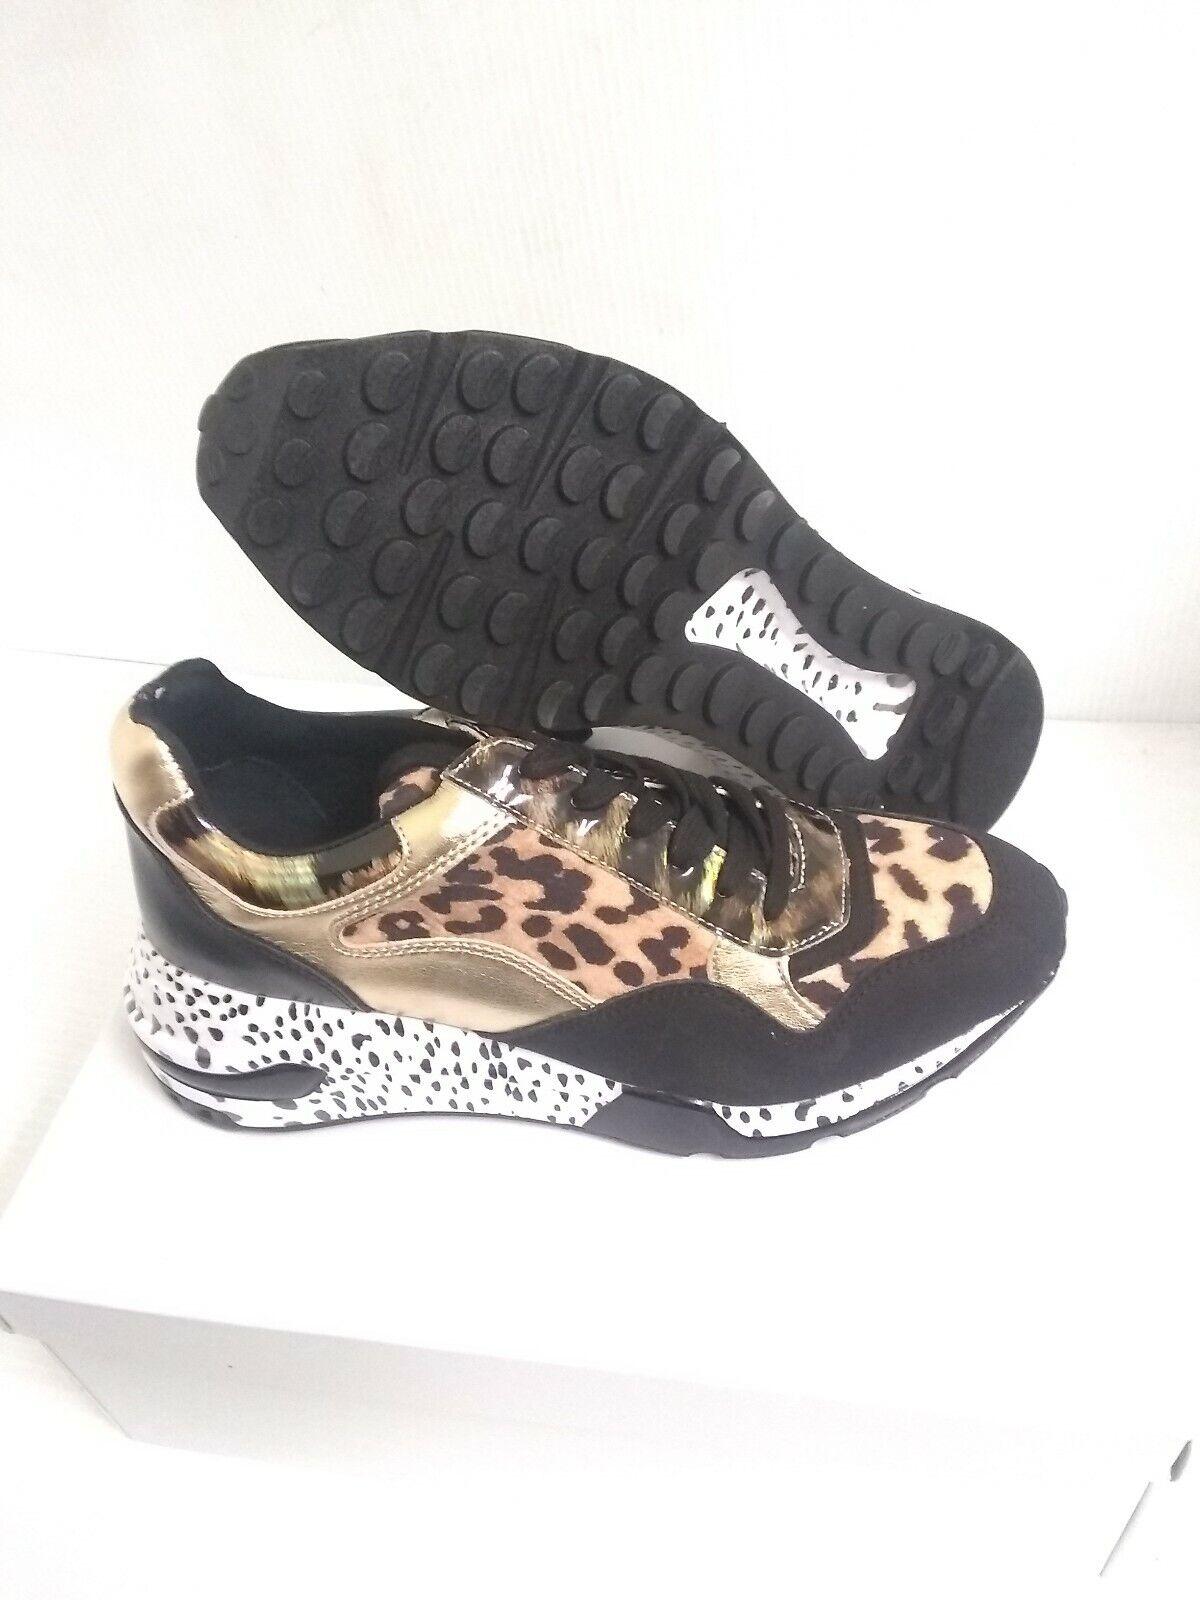 Femmes Steve Madden Chaussures Course Bena Léopard Taille 6 US